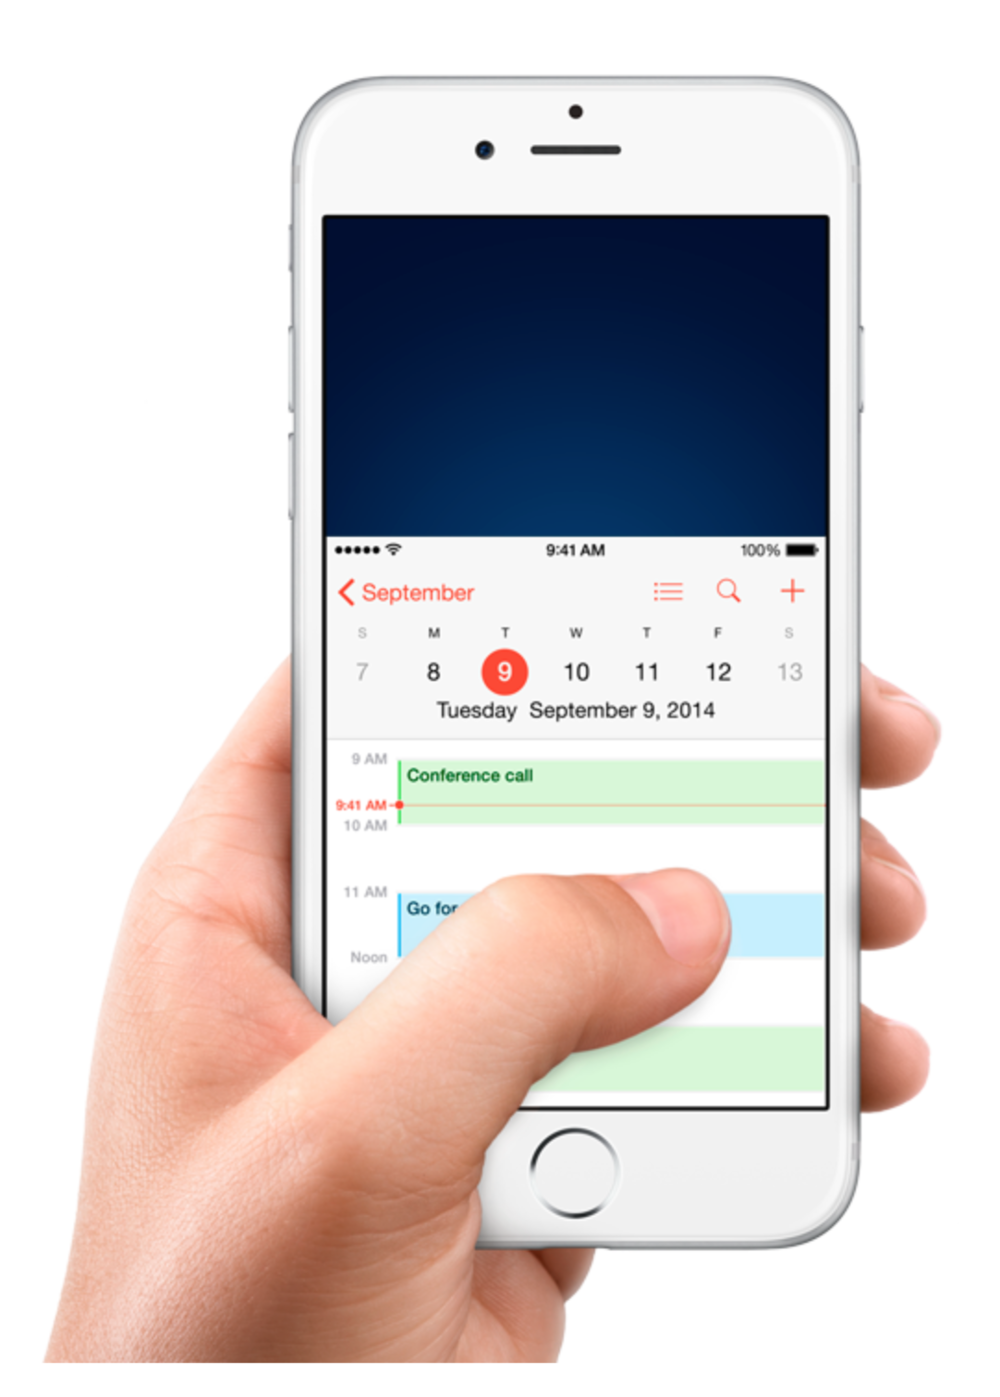 3.Reachability at iOS8by Apple